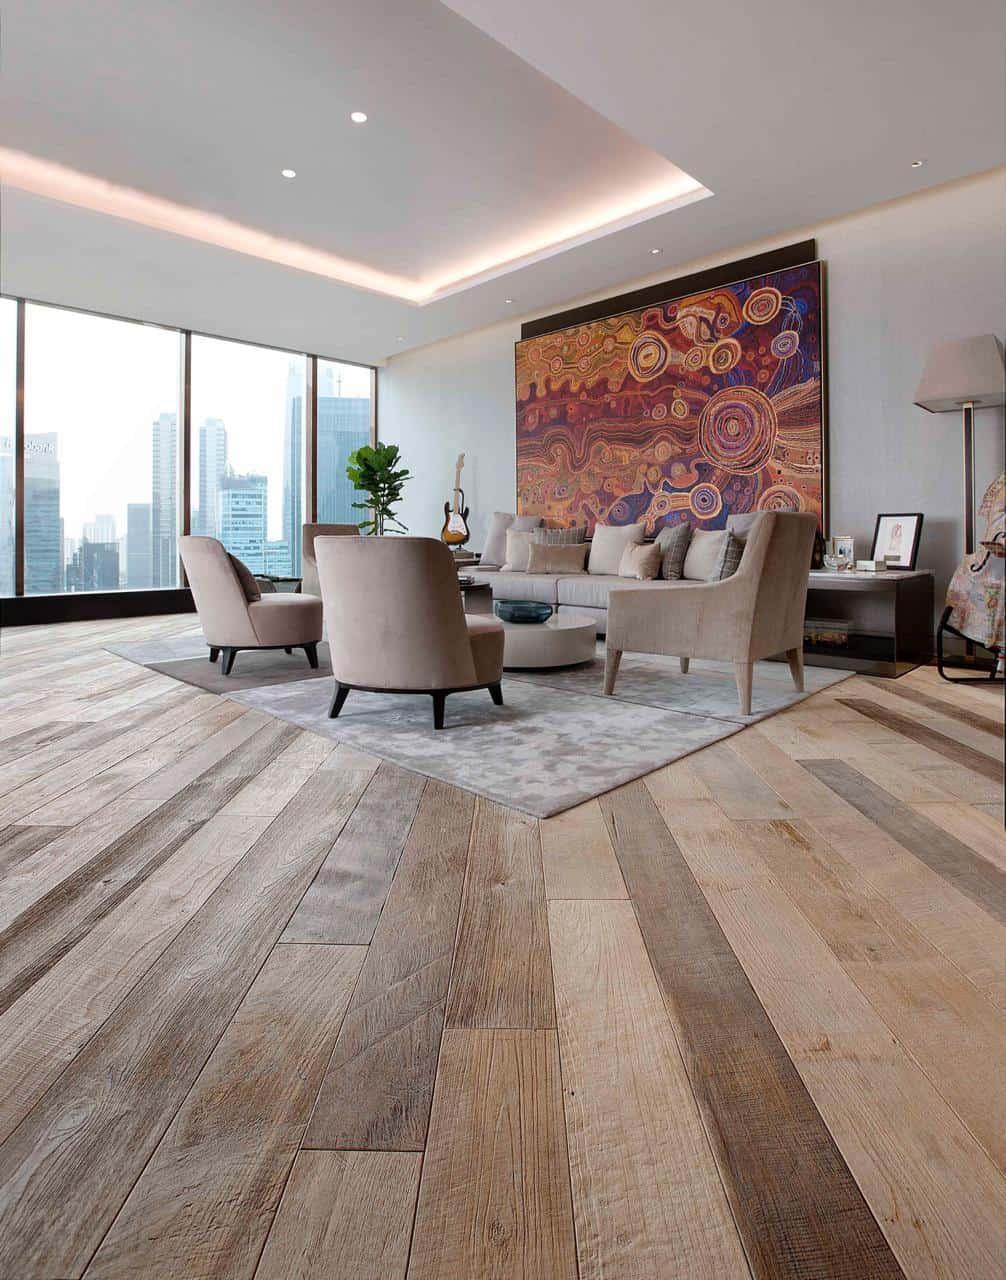 823d3692 b0bf 4c81 8a13 12dbf5fc13b2 - Reclaimed Teak Flooring